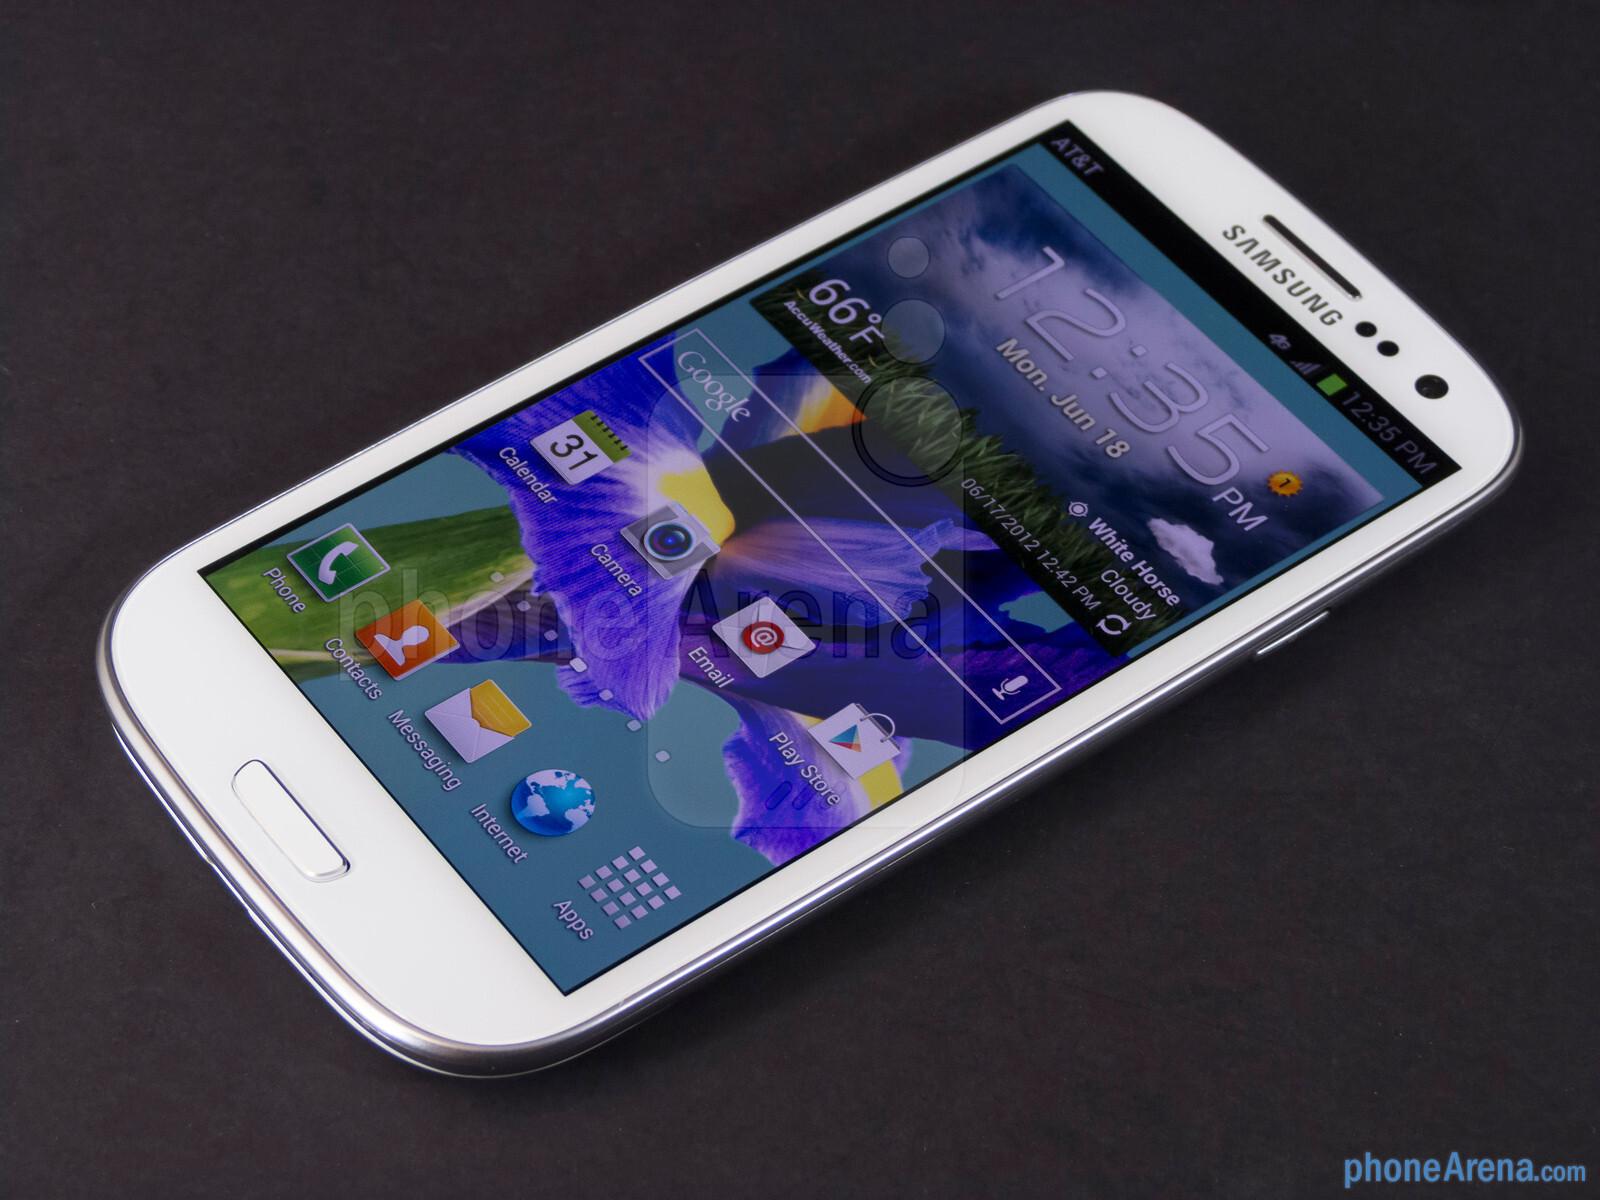 Samsung galaxy battery s3 verizon - Samsung Galaxy S Iii Review At T Verizon T Mobile Sprint